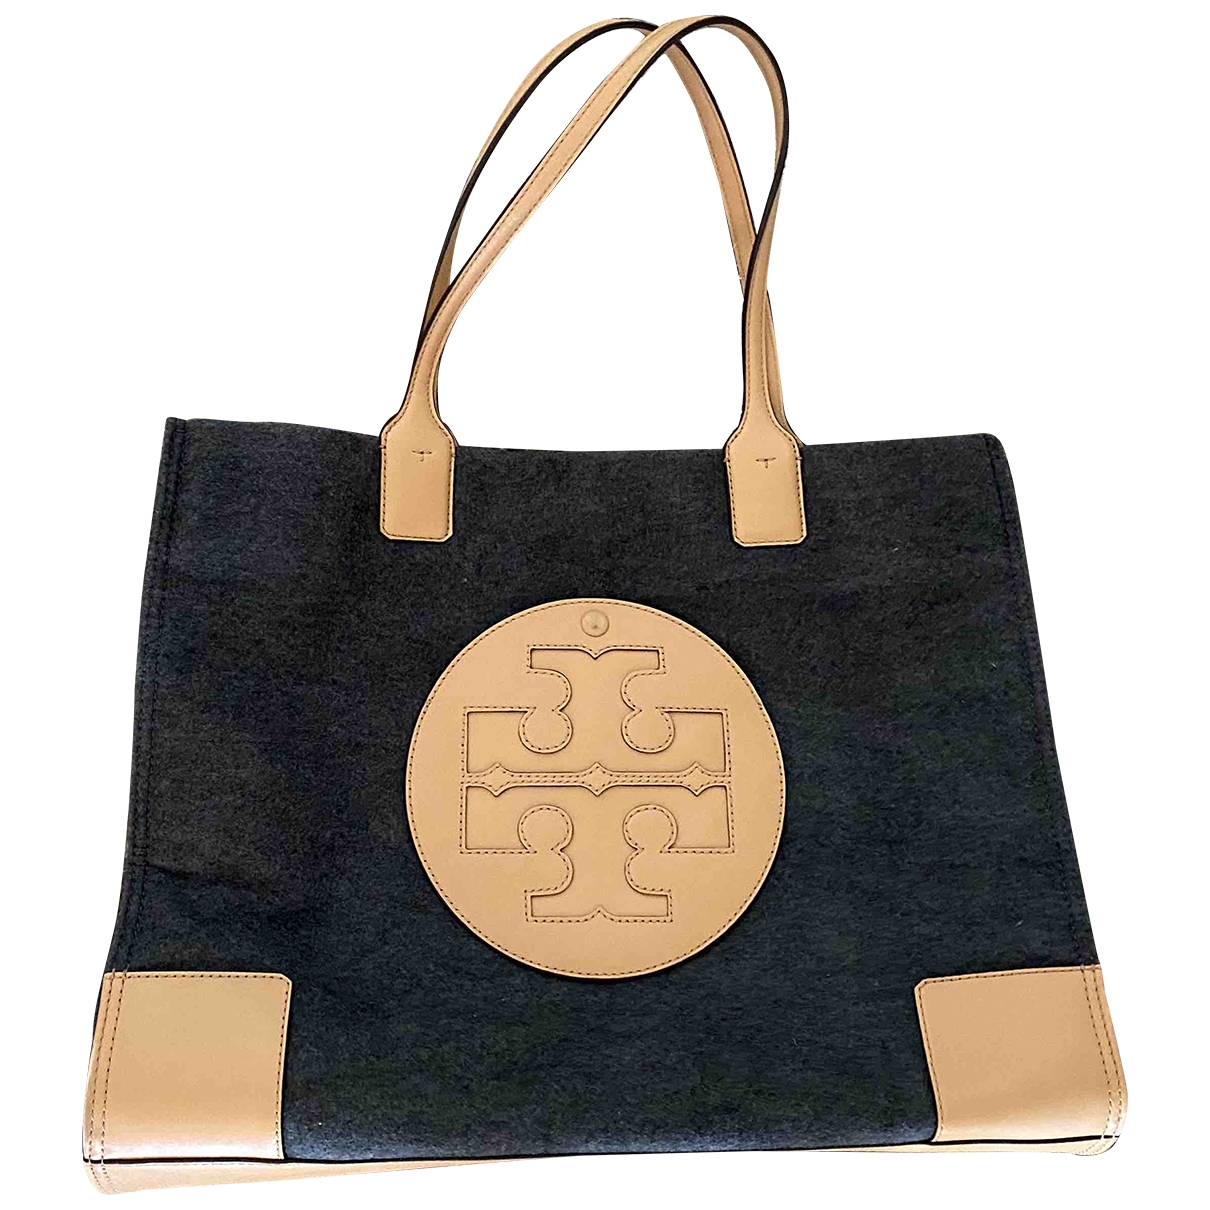 Tory Burch \N Handtasche in  Anthrazit Wolle